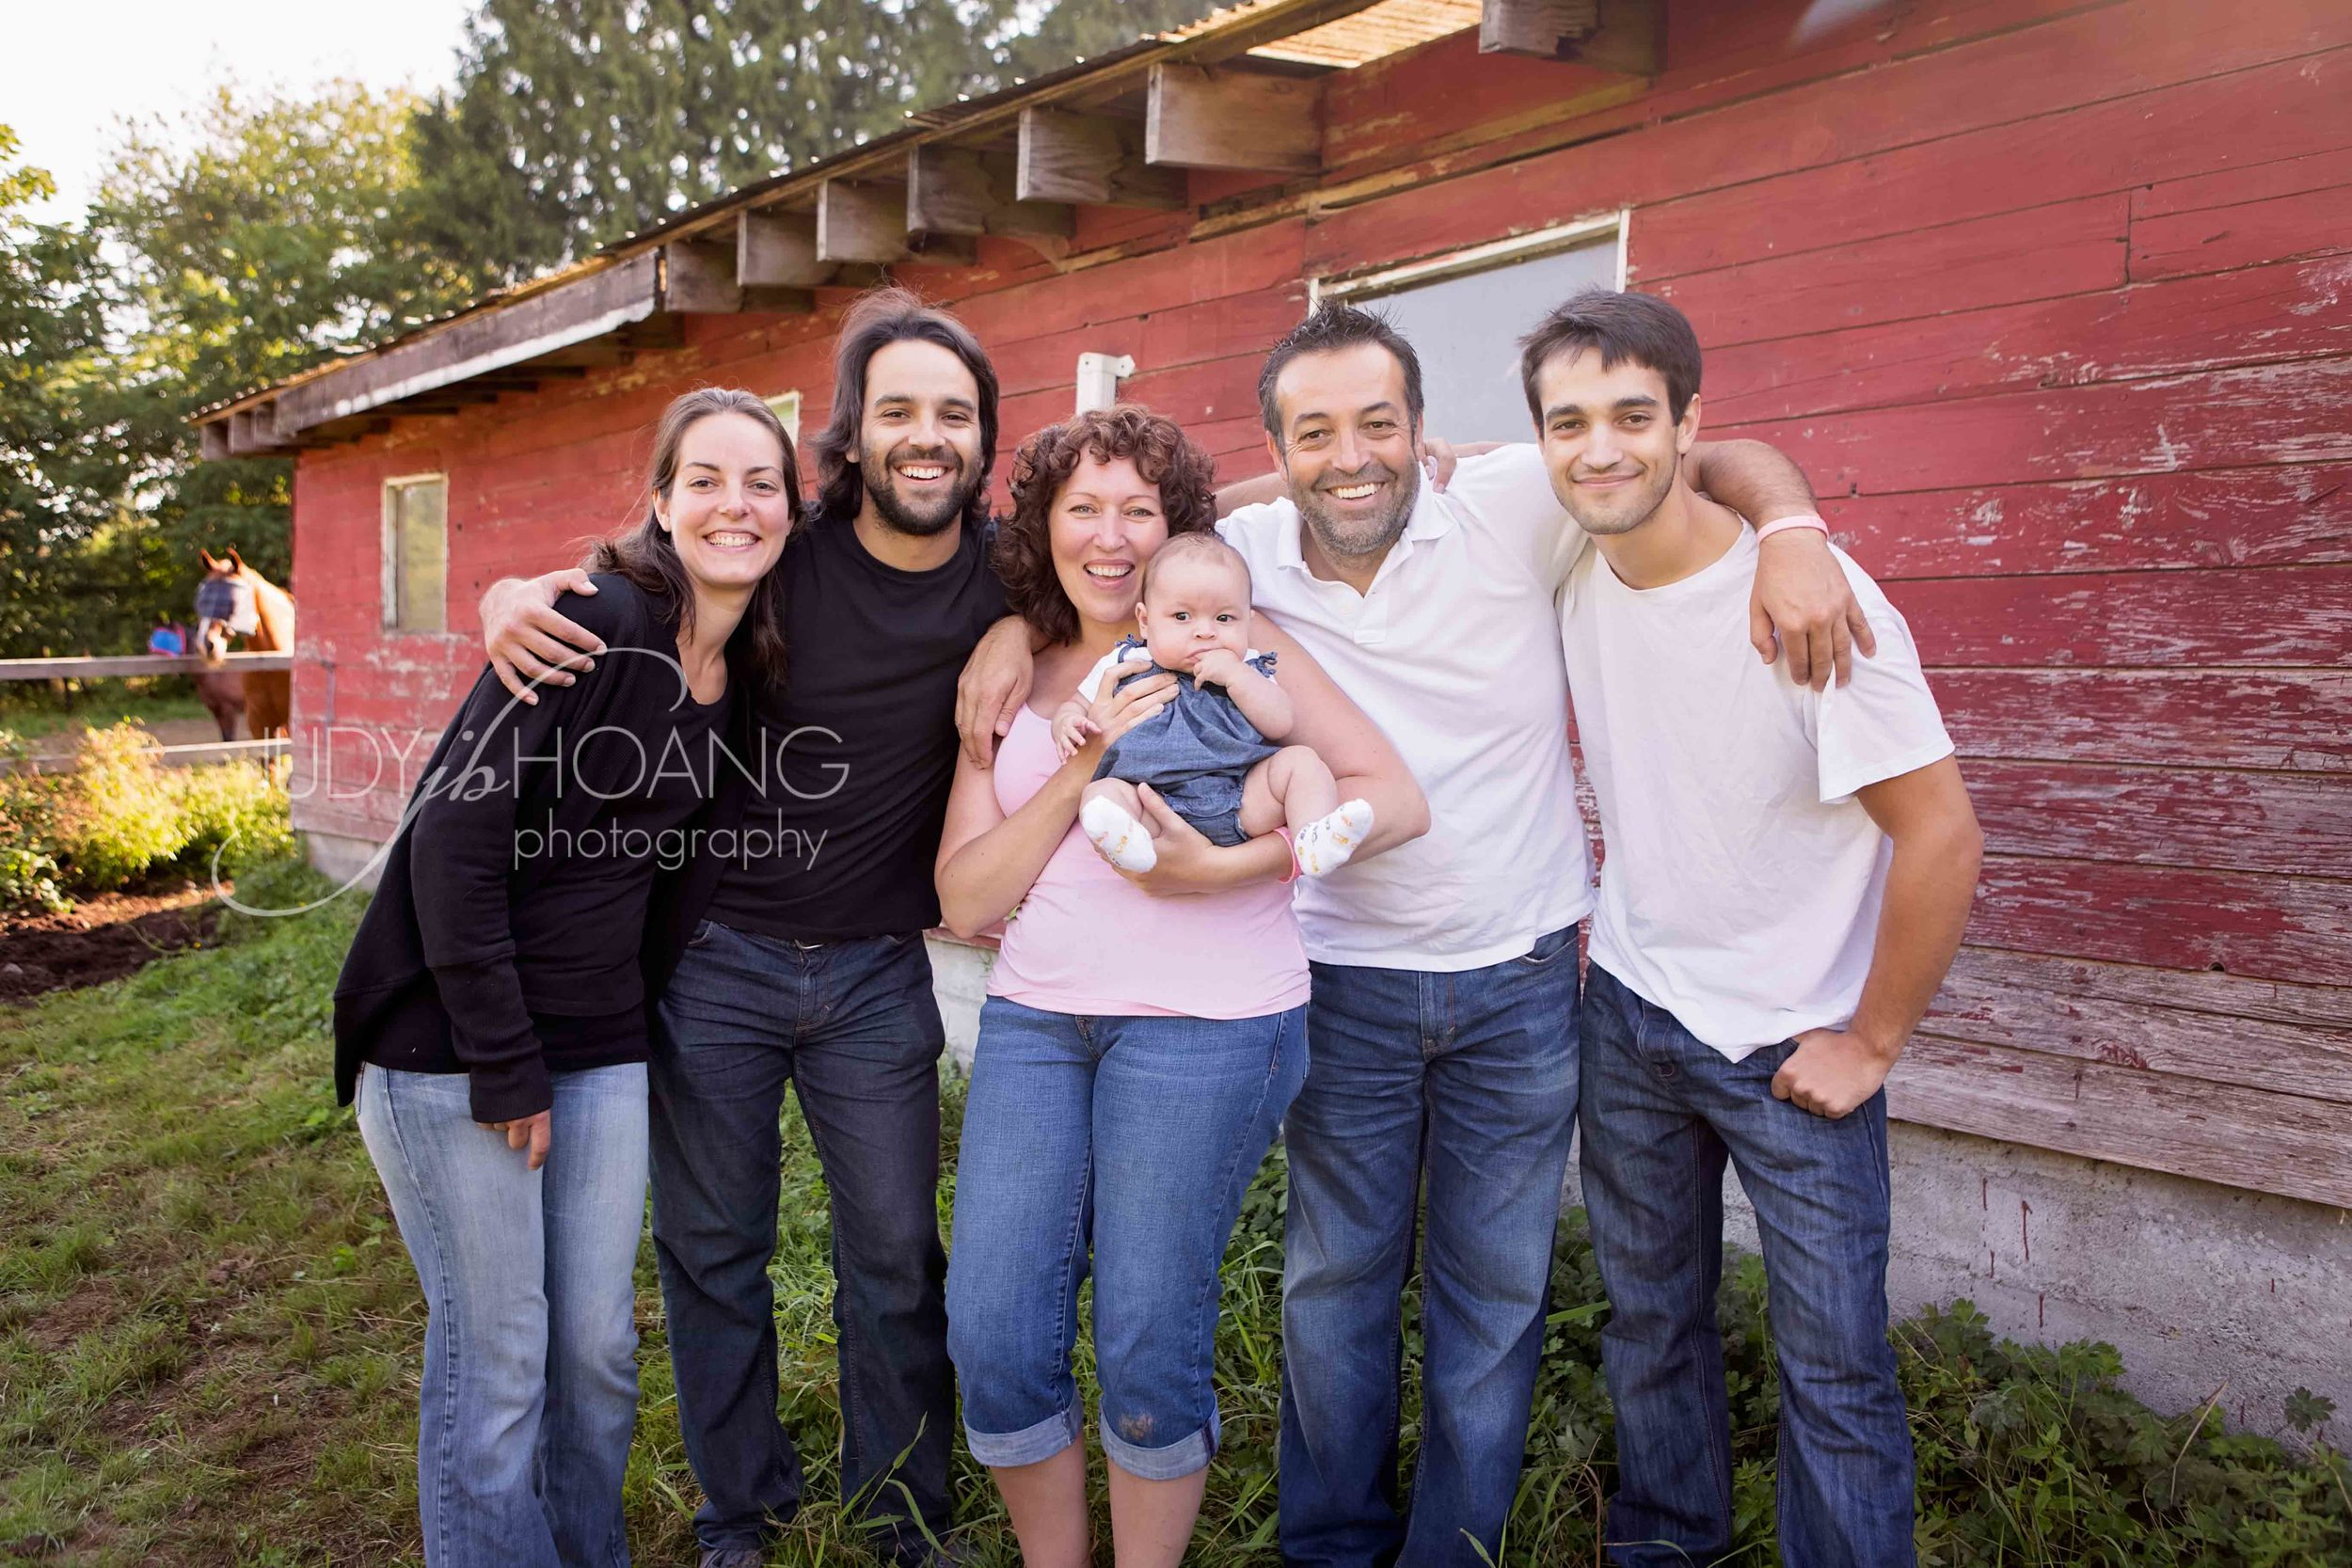 Judy Hoang Photography - Helen and Jorge Family-25.JPG